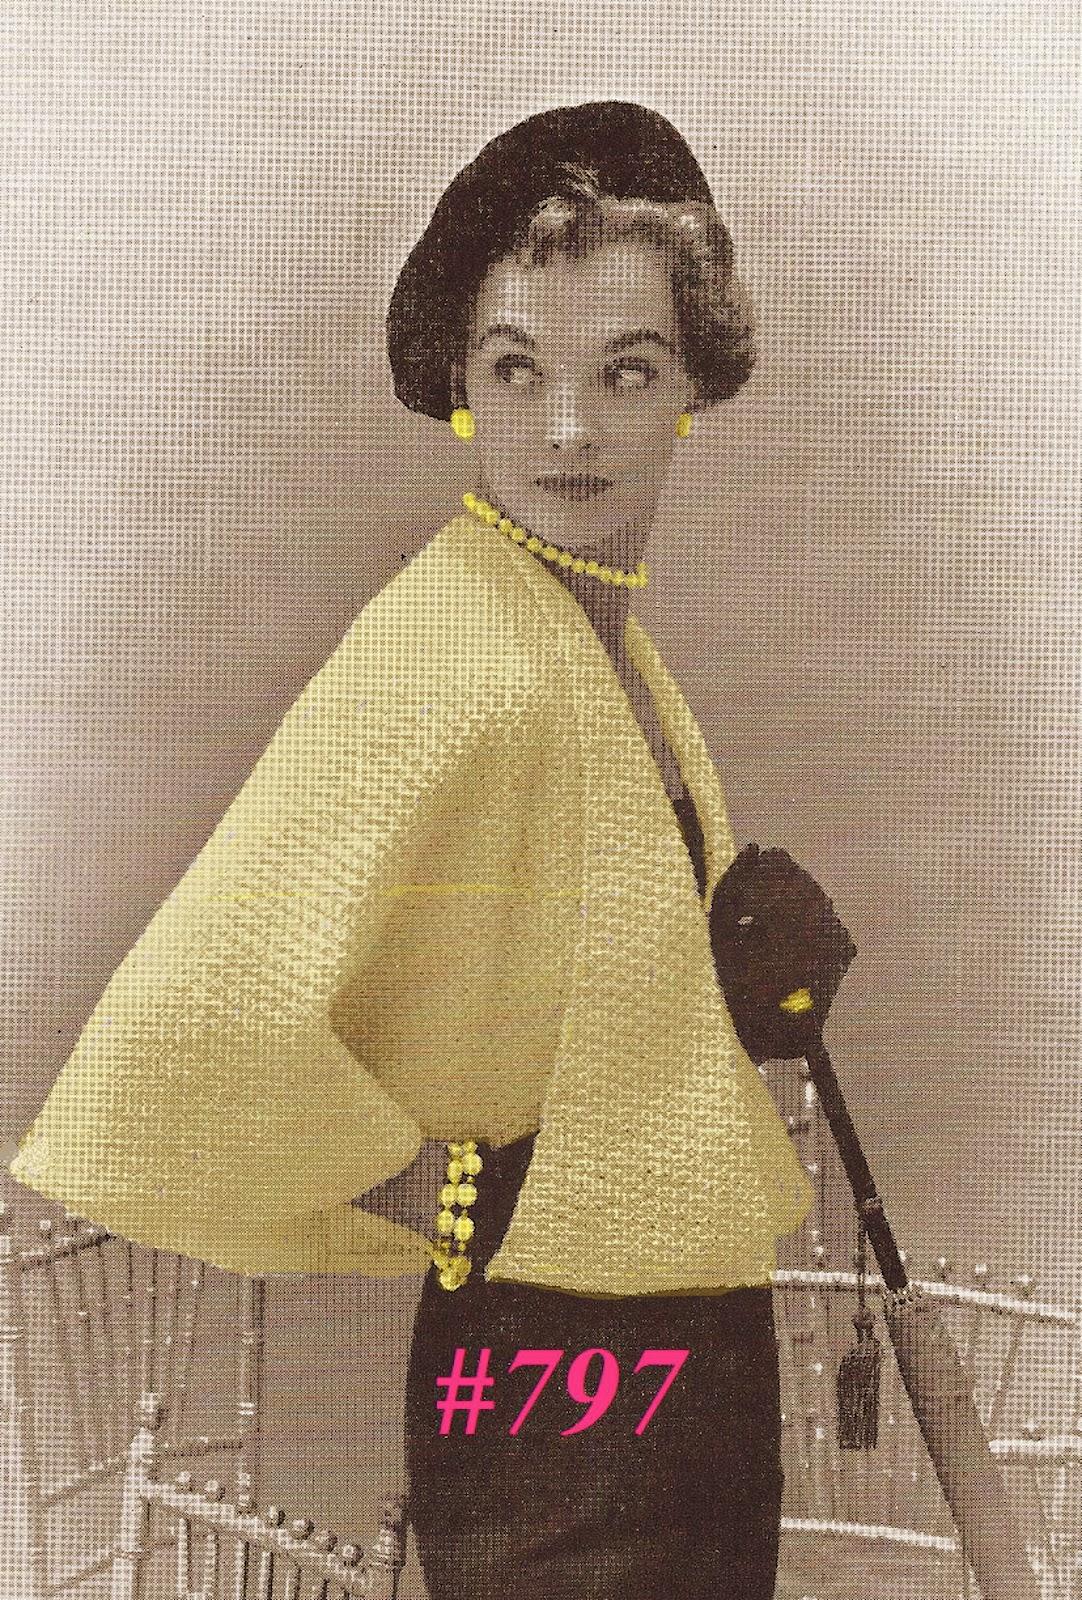 Free Vintage Crochet Cape Patterns : Miss Julias Patterns: Cozy Capes to Knit - Crochet & Free ...